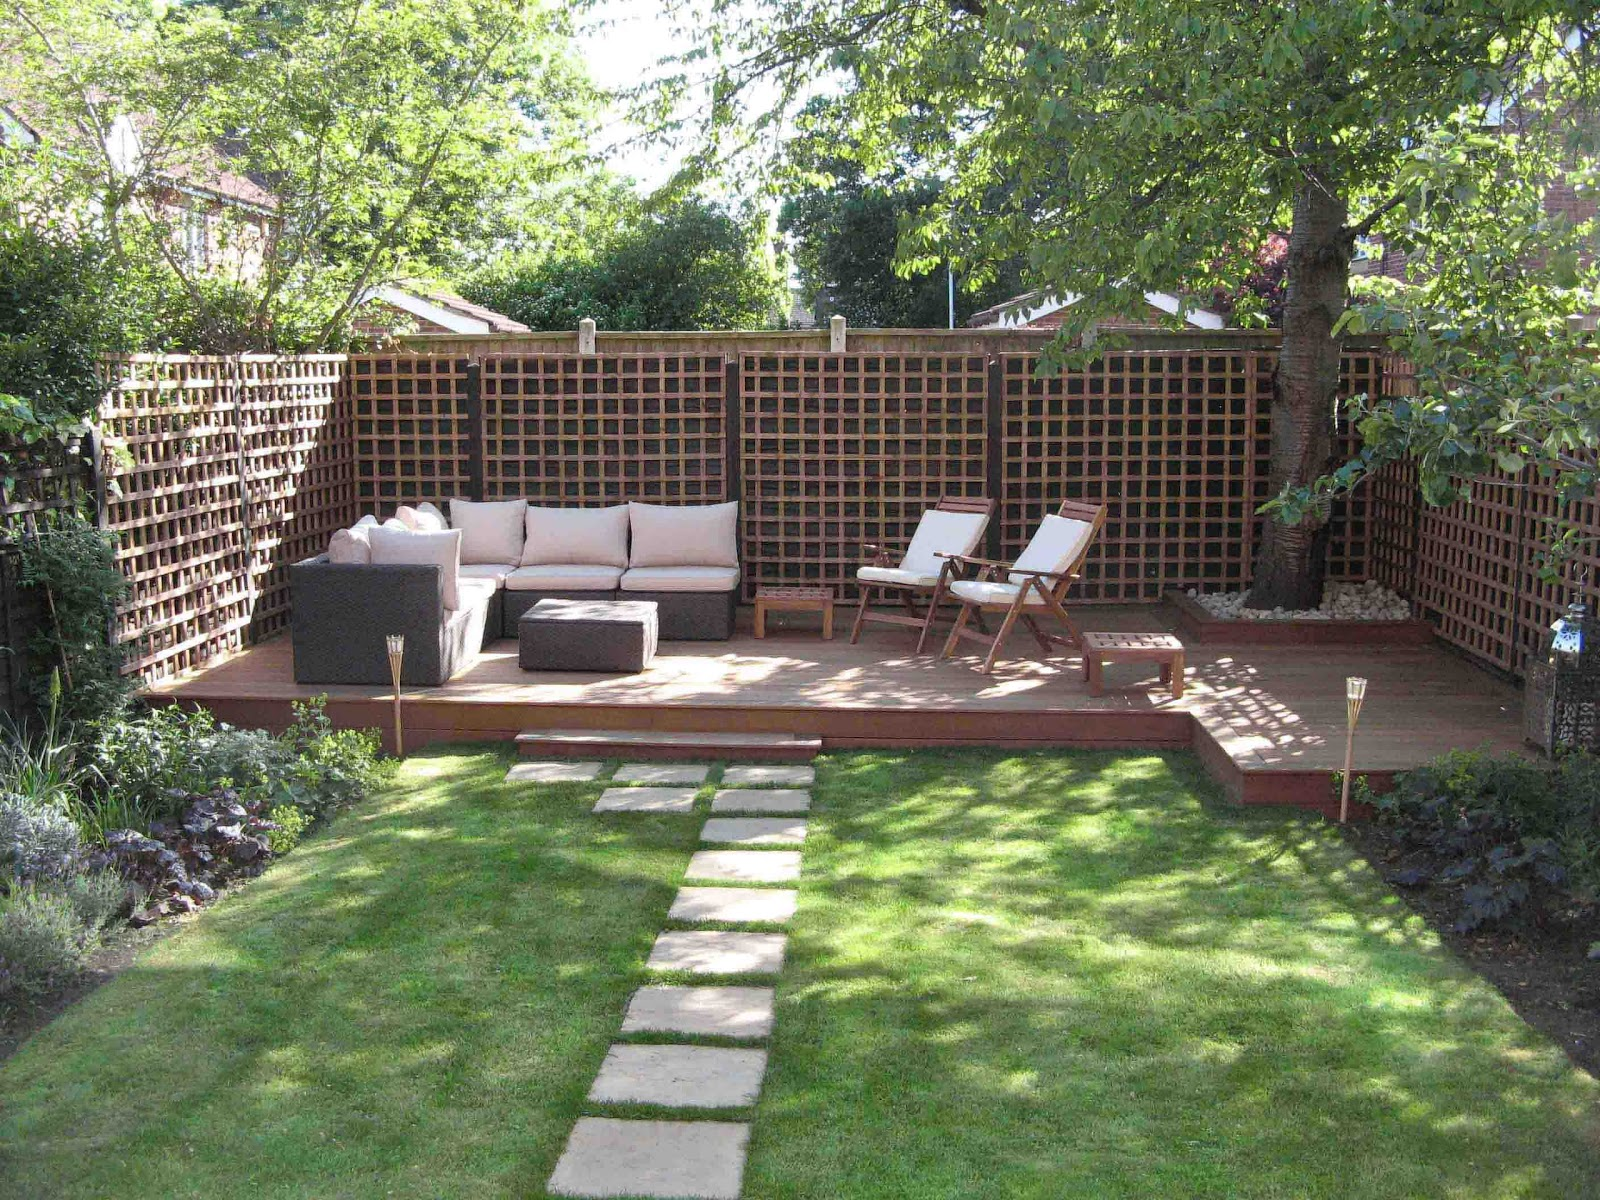 Garden Designs for Small Gardens | Home Interior Designs ... on Small Patio Design Ideas  id=12685